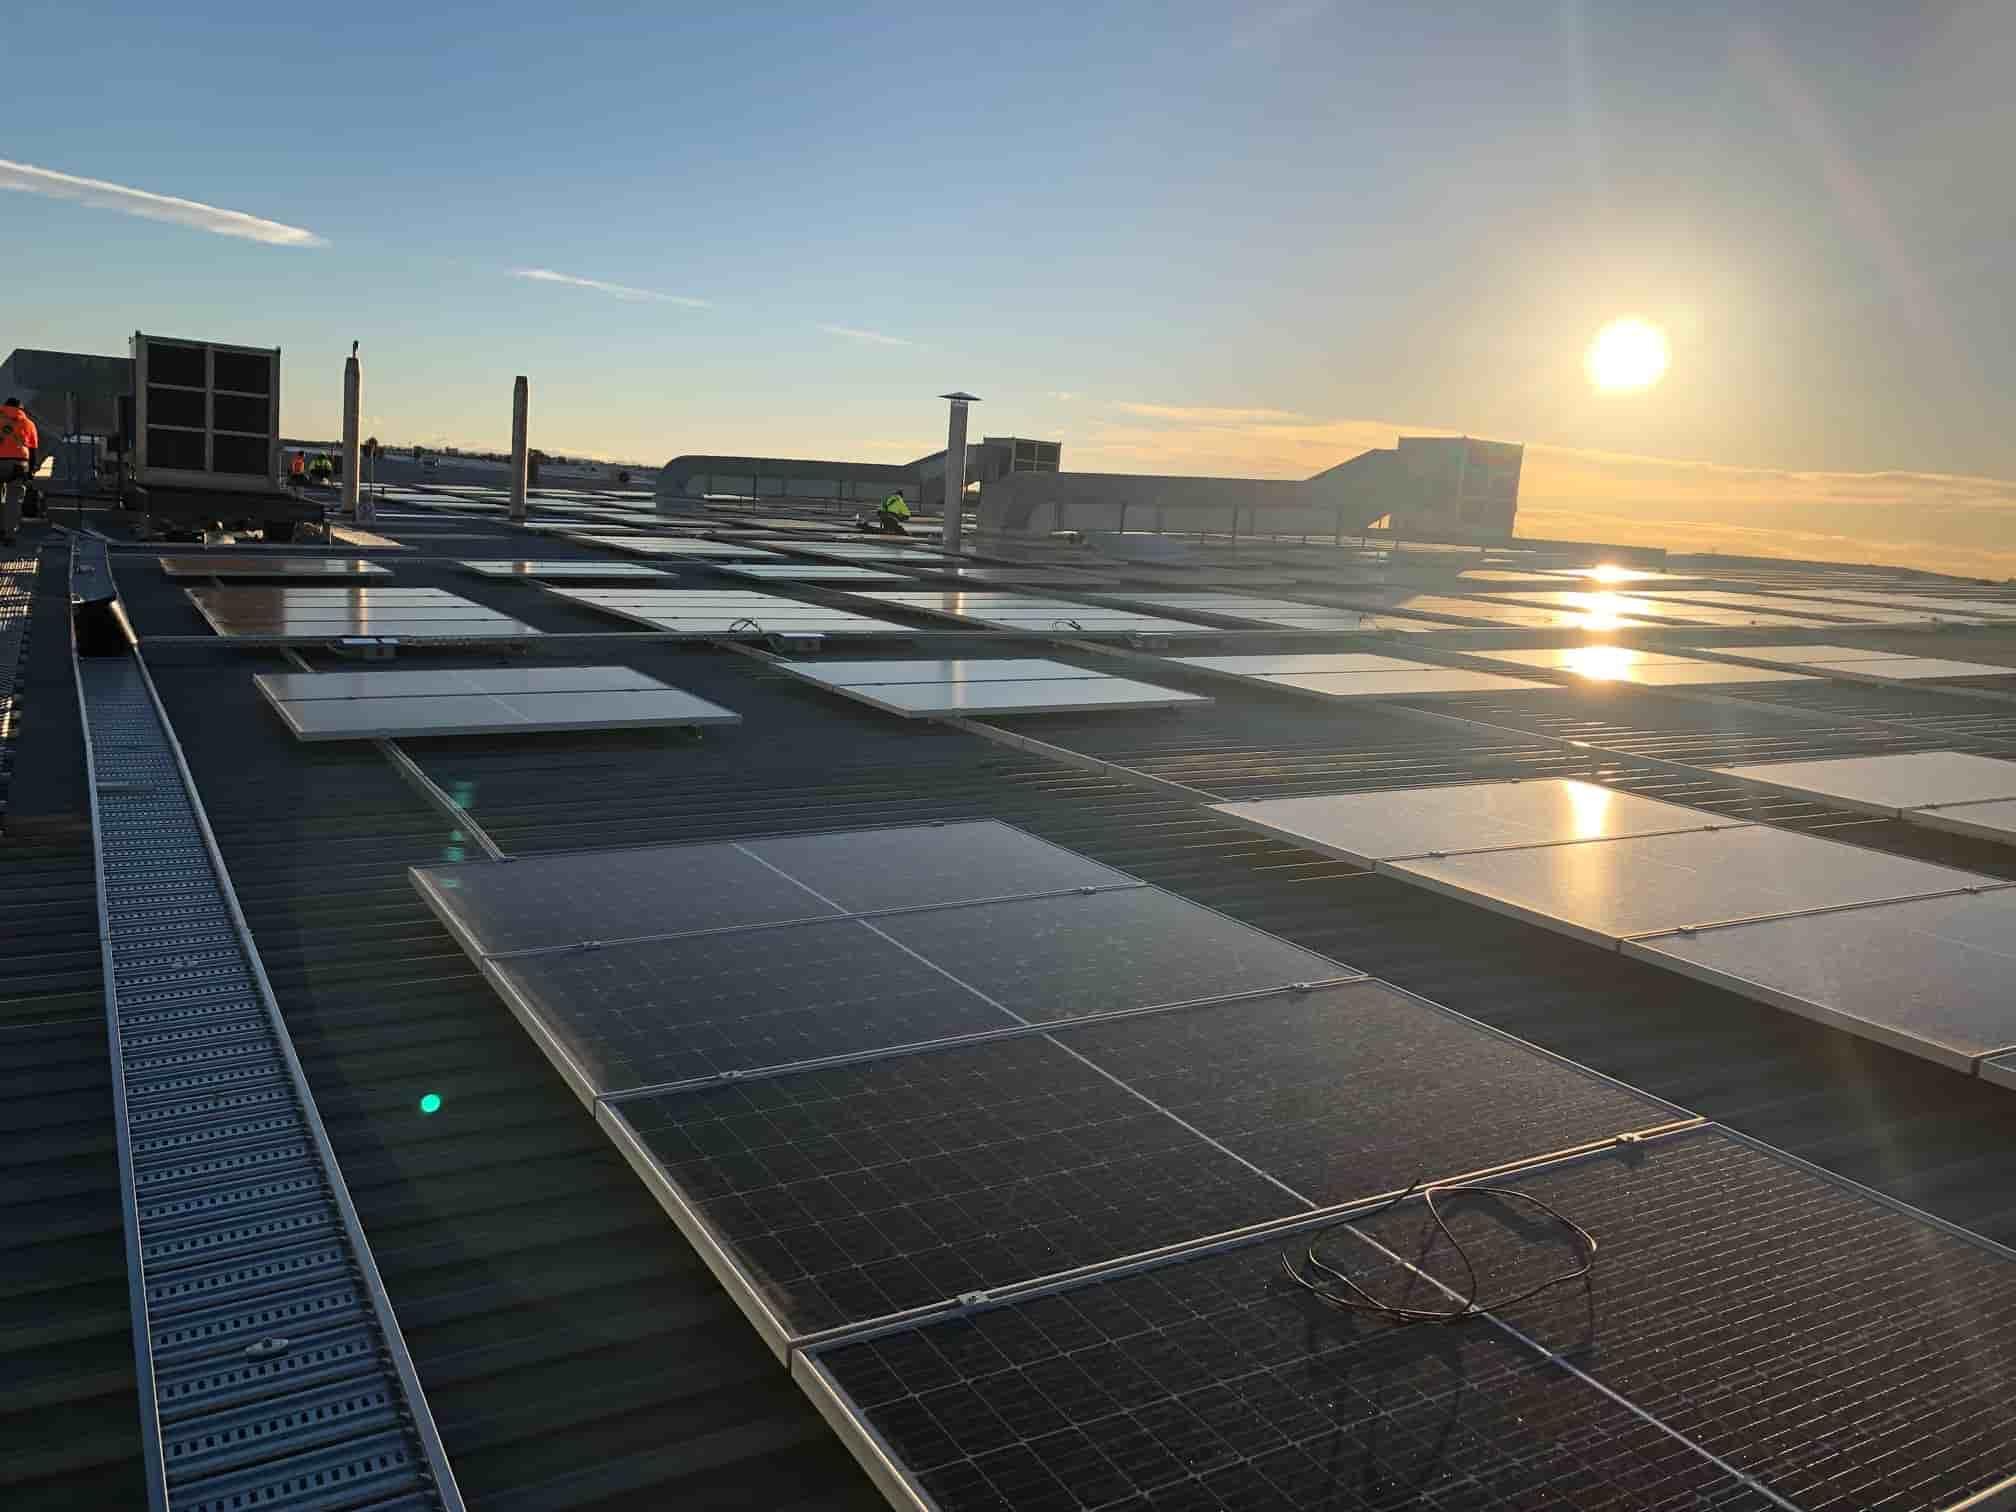 CHEP Australia's solar energy system